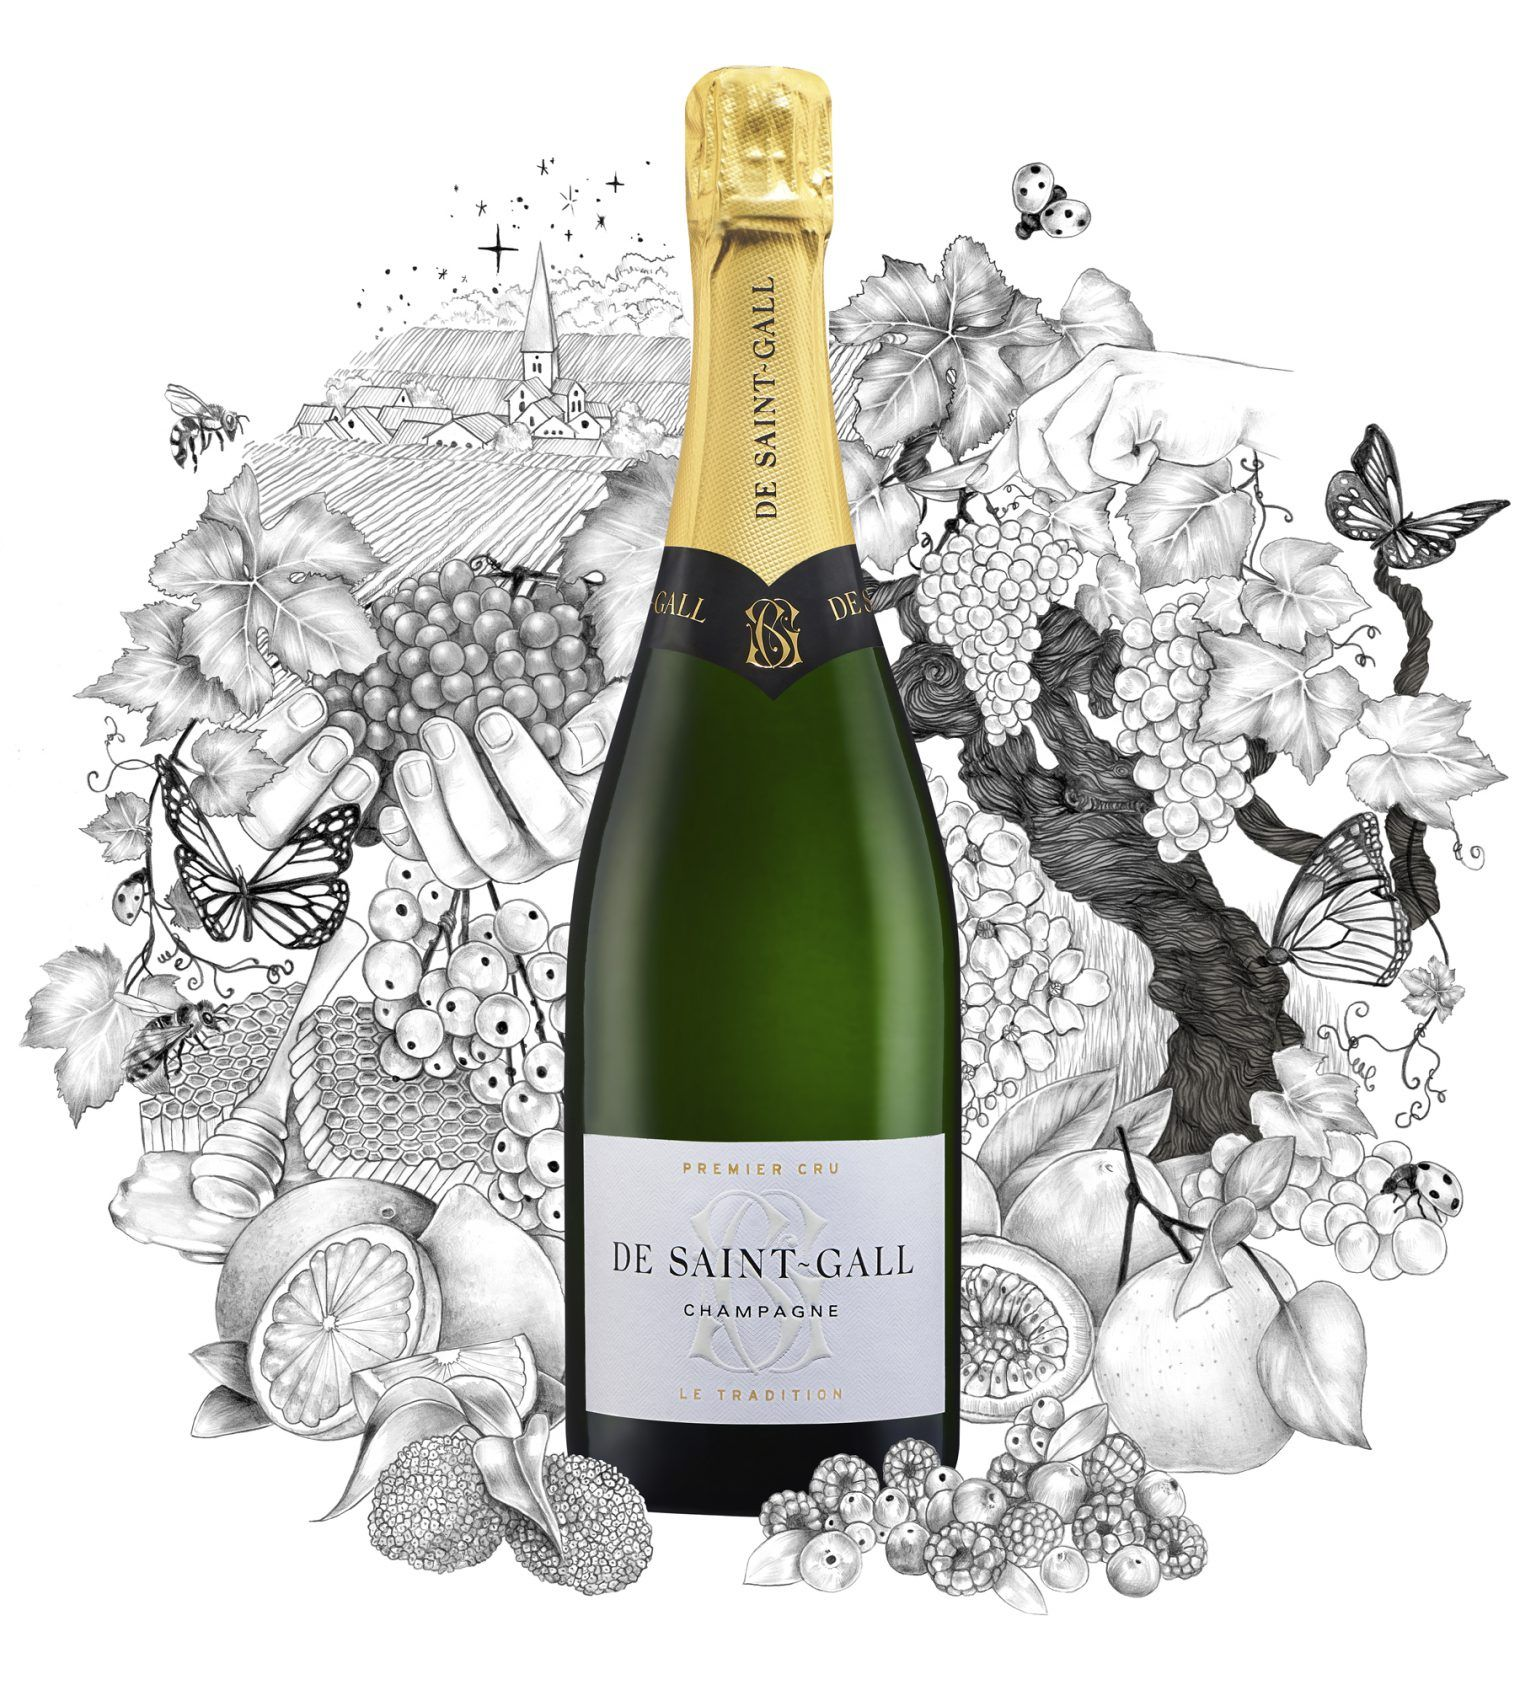 Champagne Premier Cru De Saint-Gall